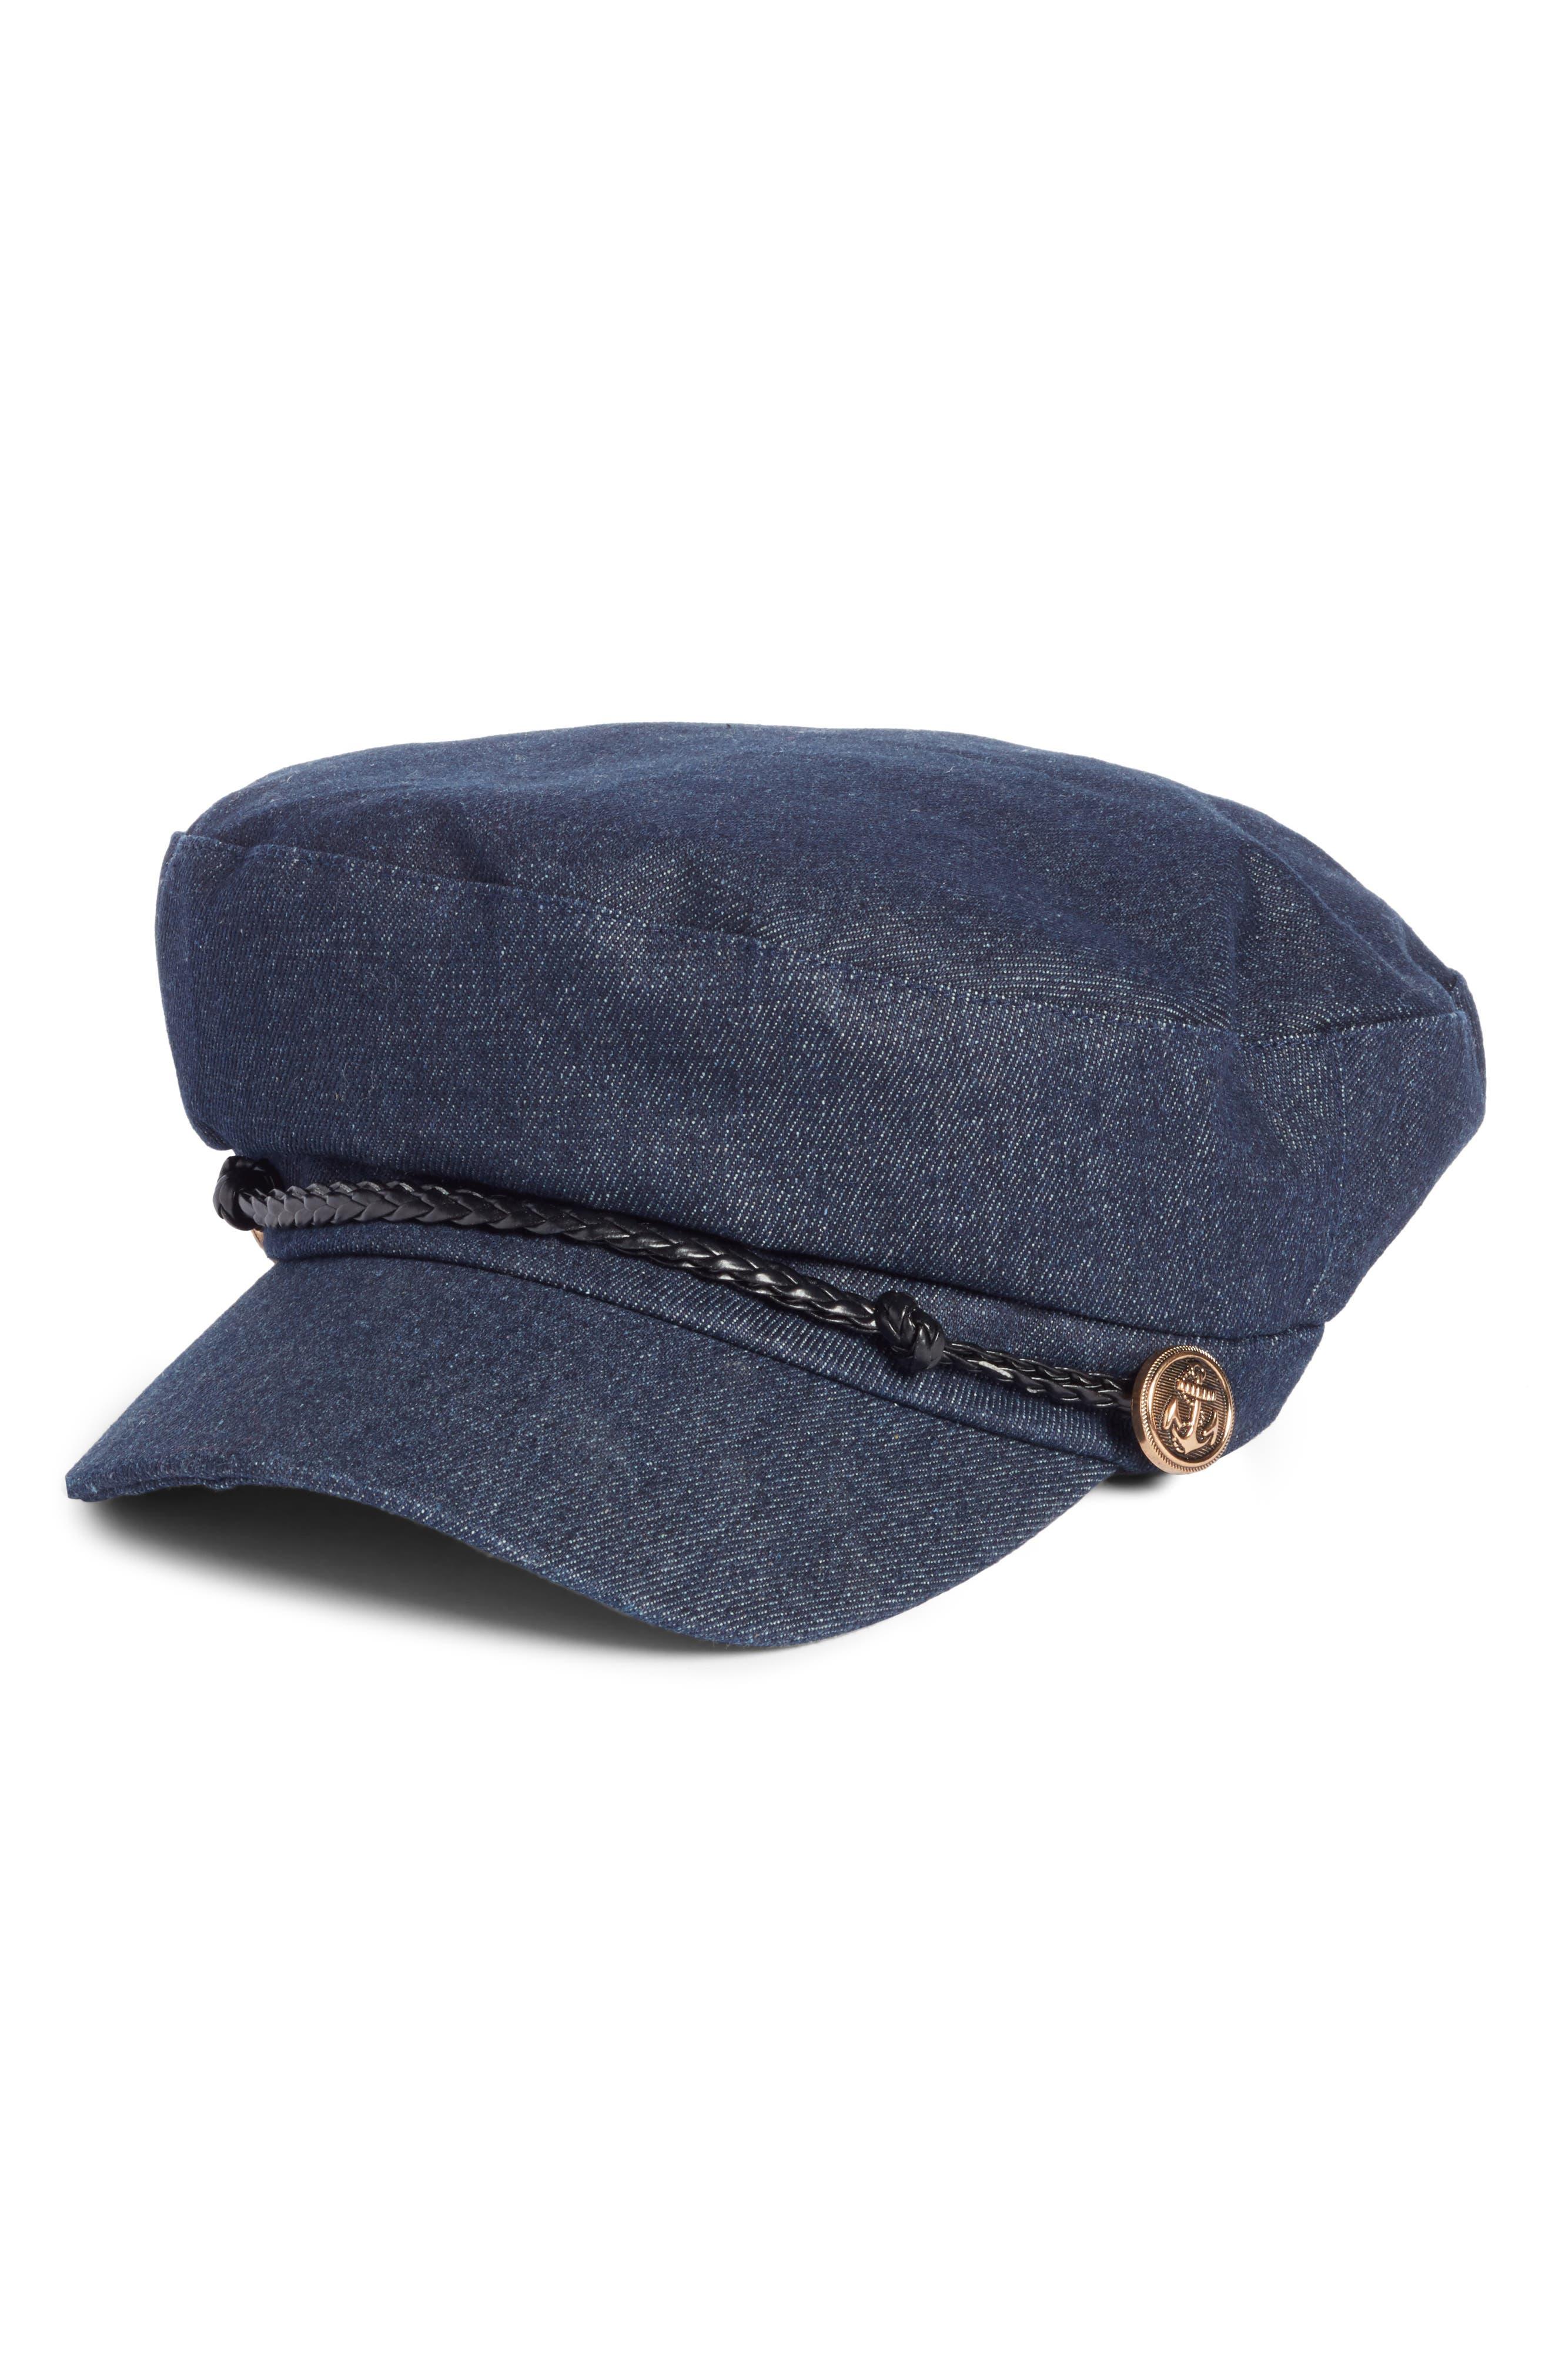 Denim Captain Hat,                             Main thumbnail 1, color,                             Dark Blue